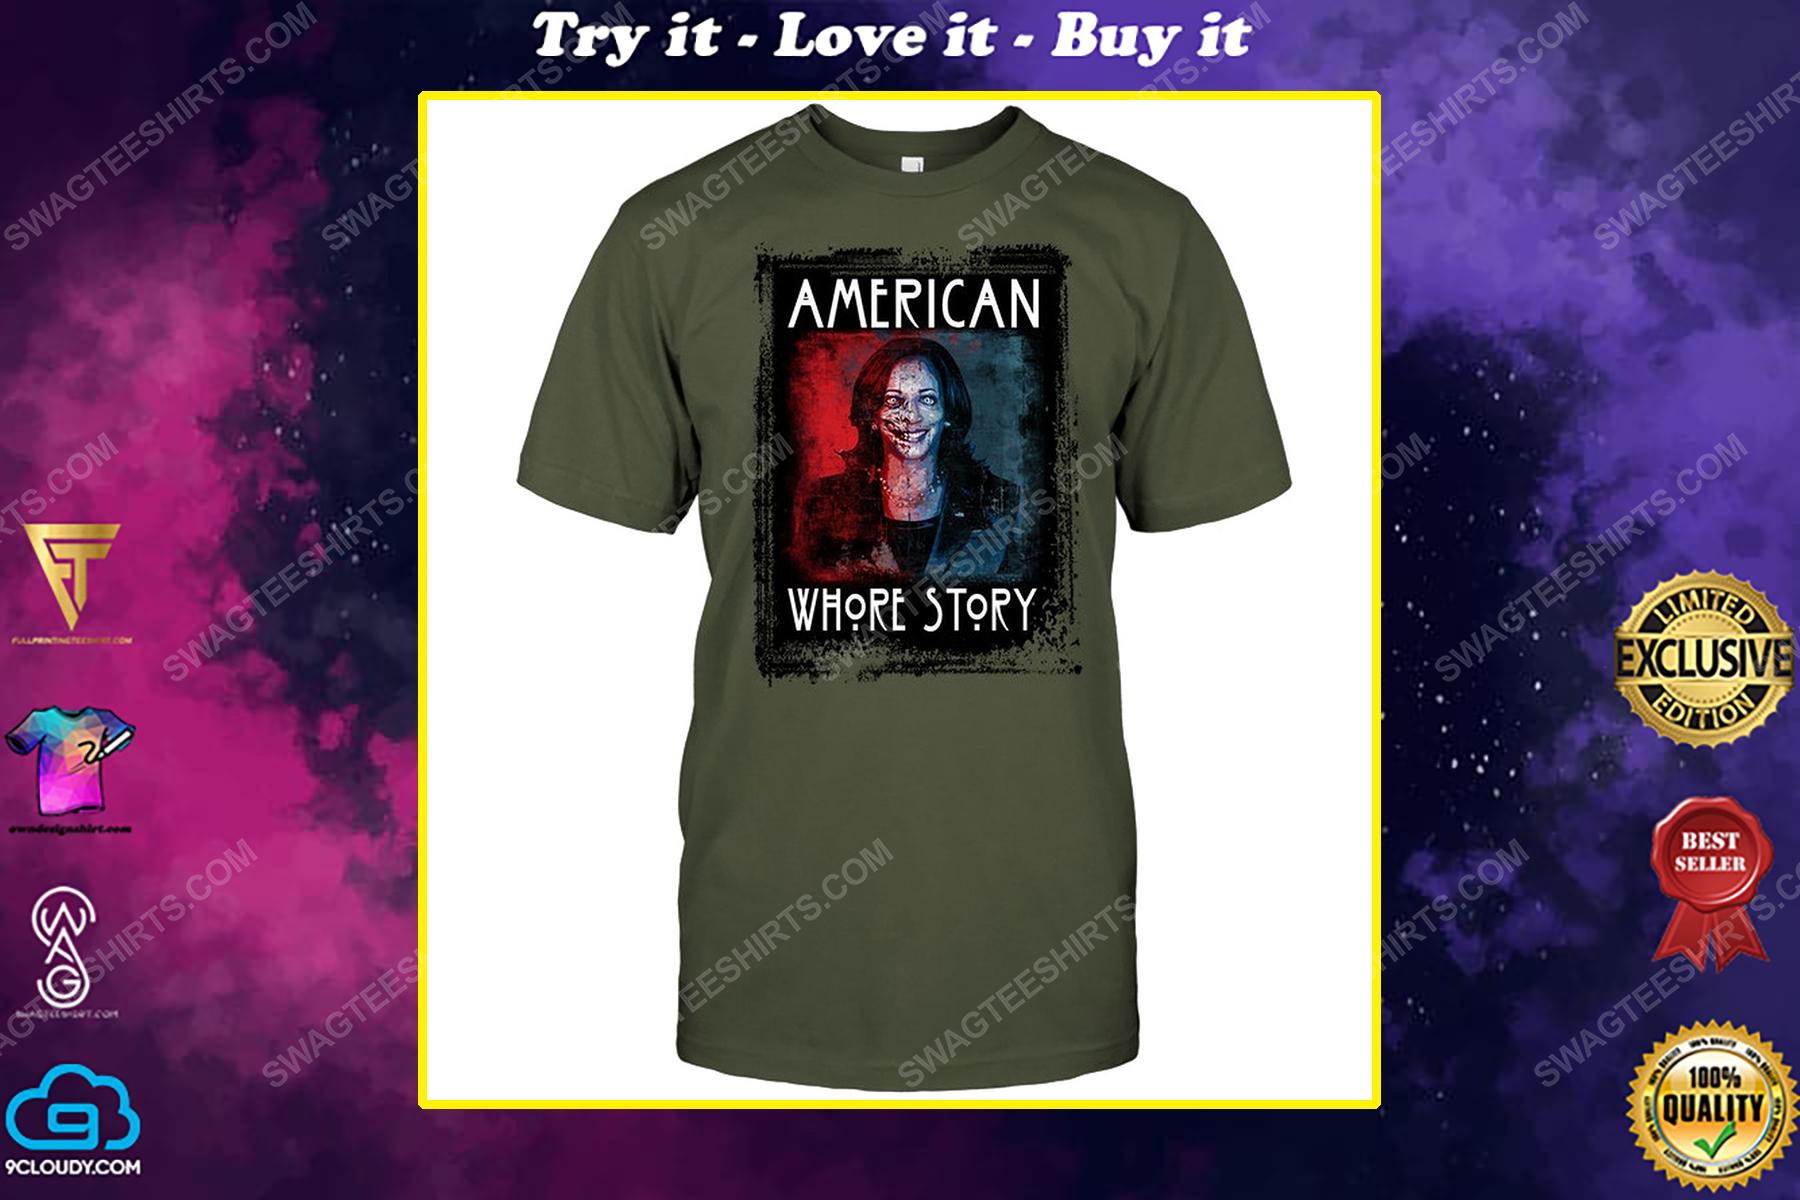 Kamala harris american whore story american horror story political shirt